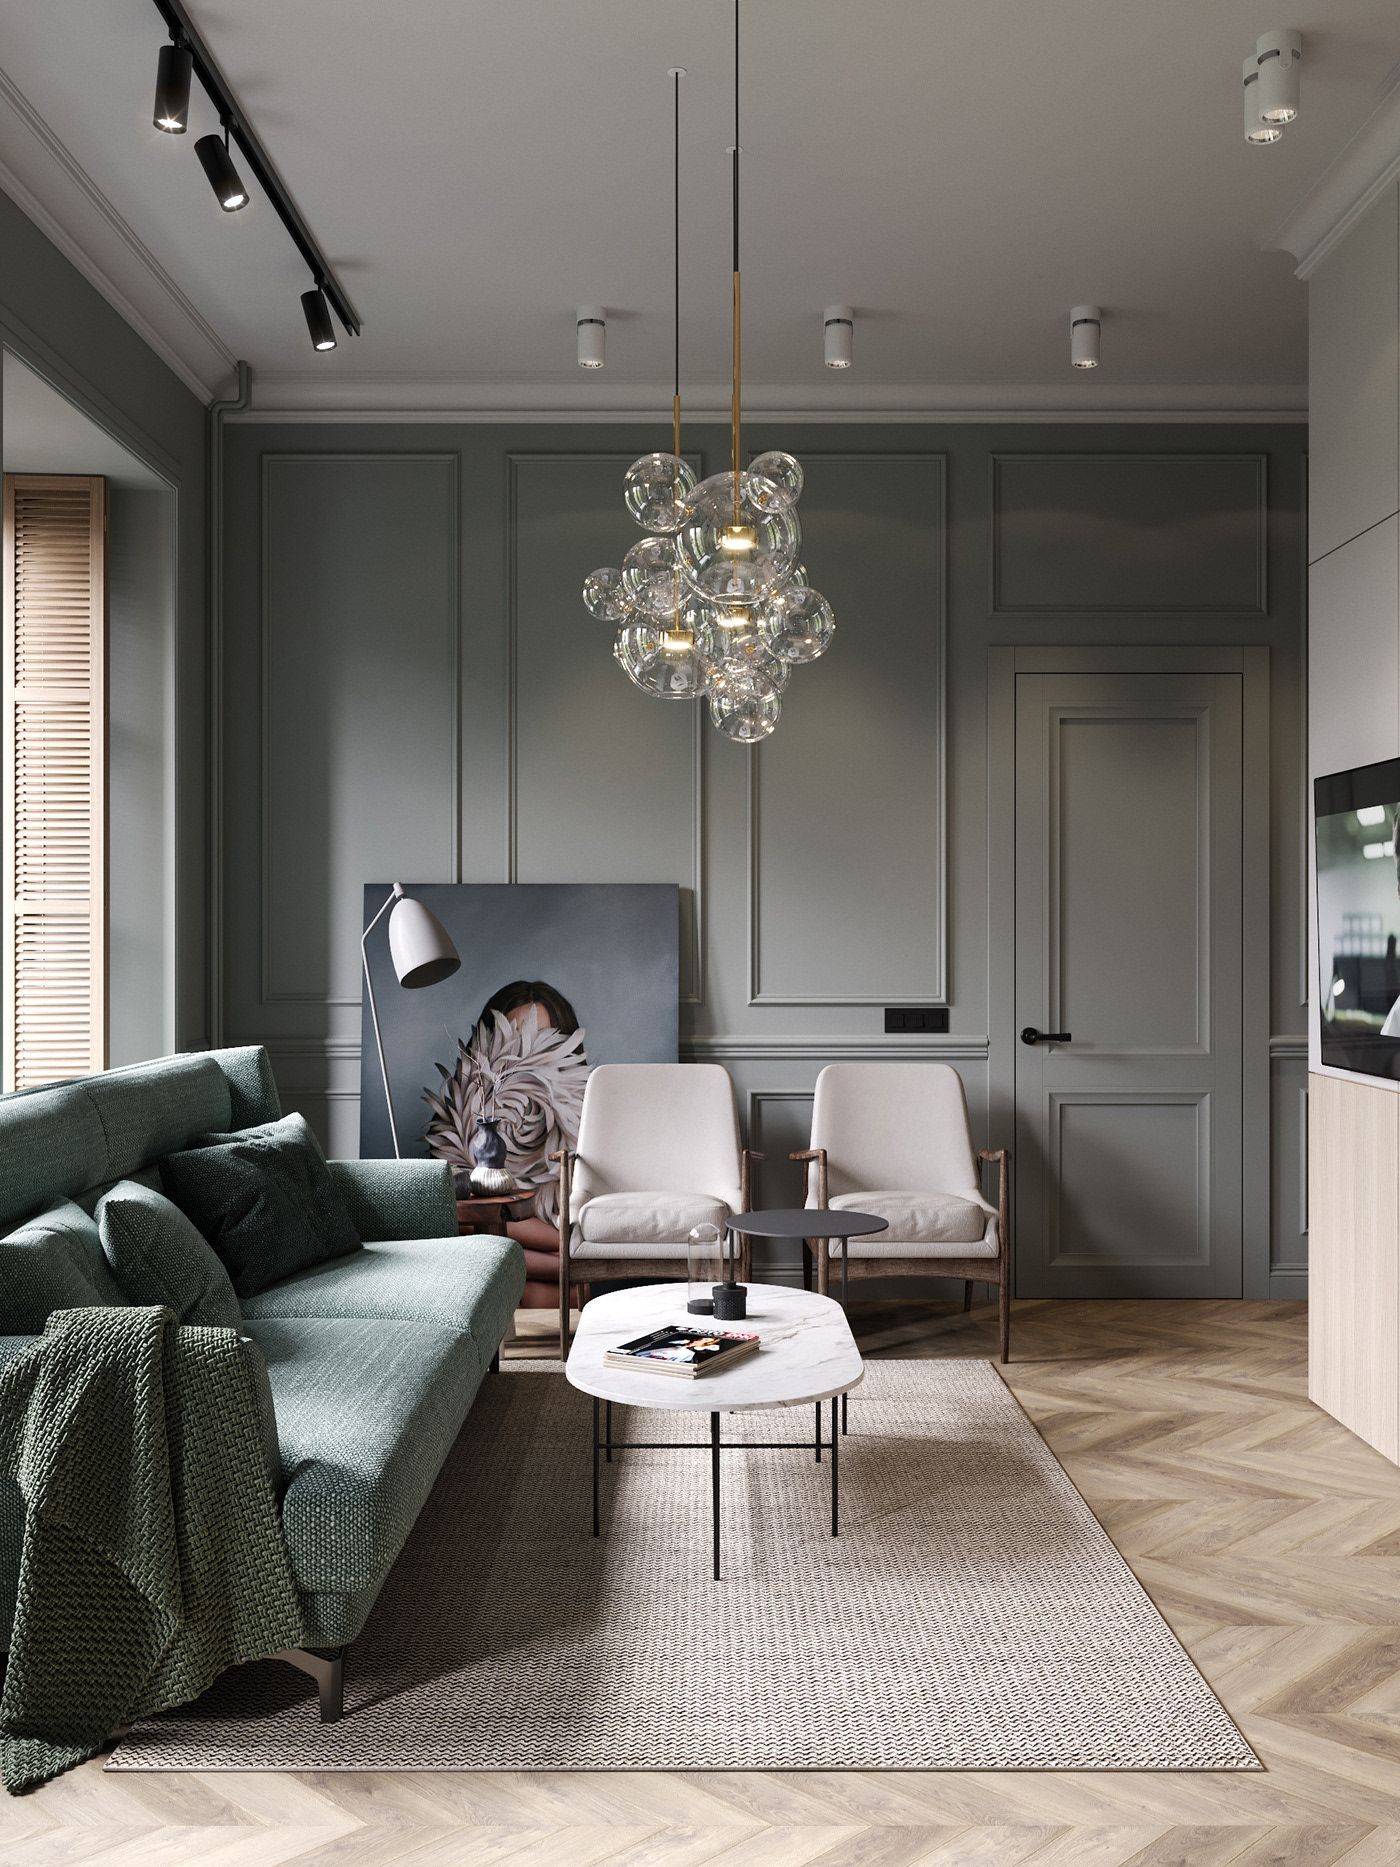 Livingroomcontemporary living room diy in pinterest interior and design also rh